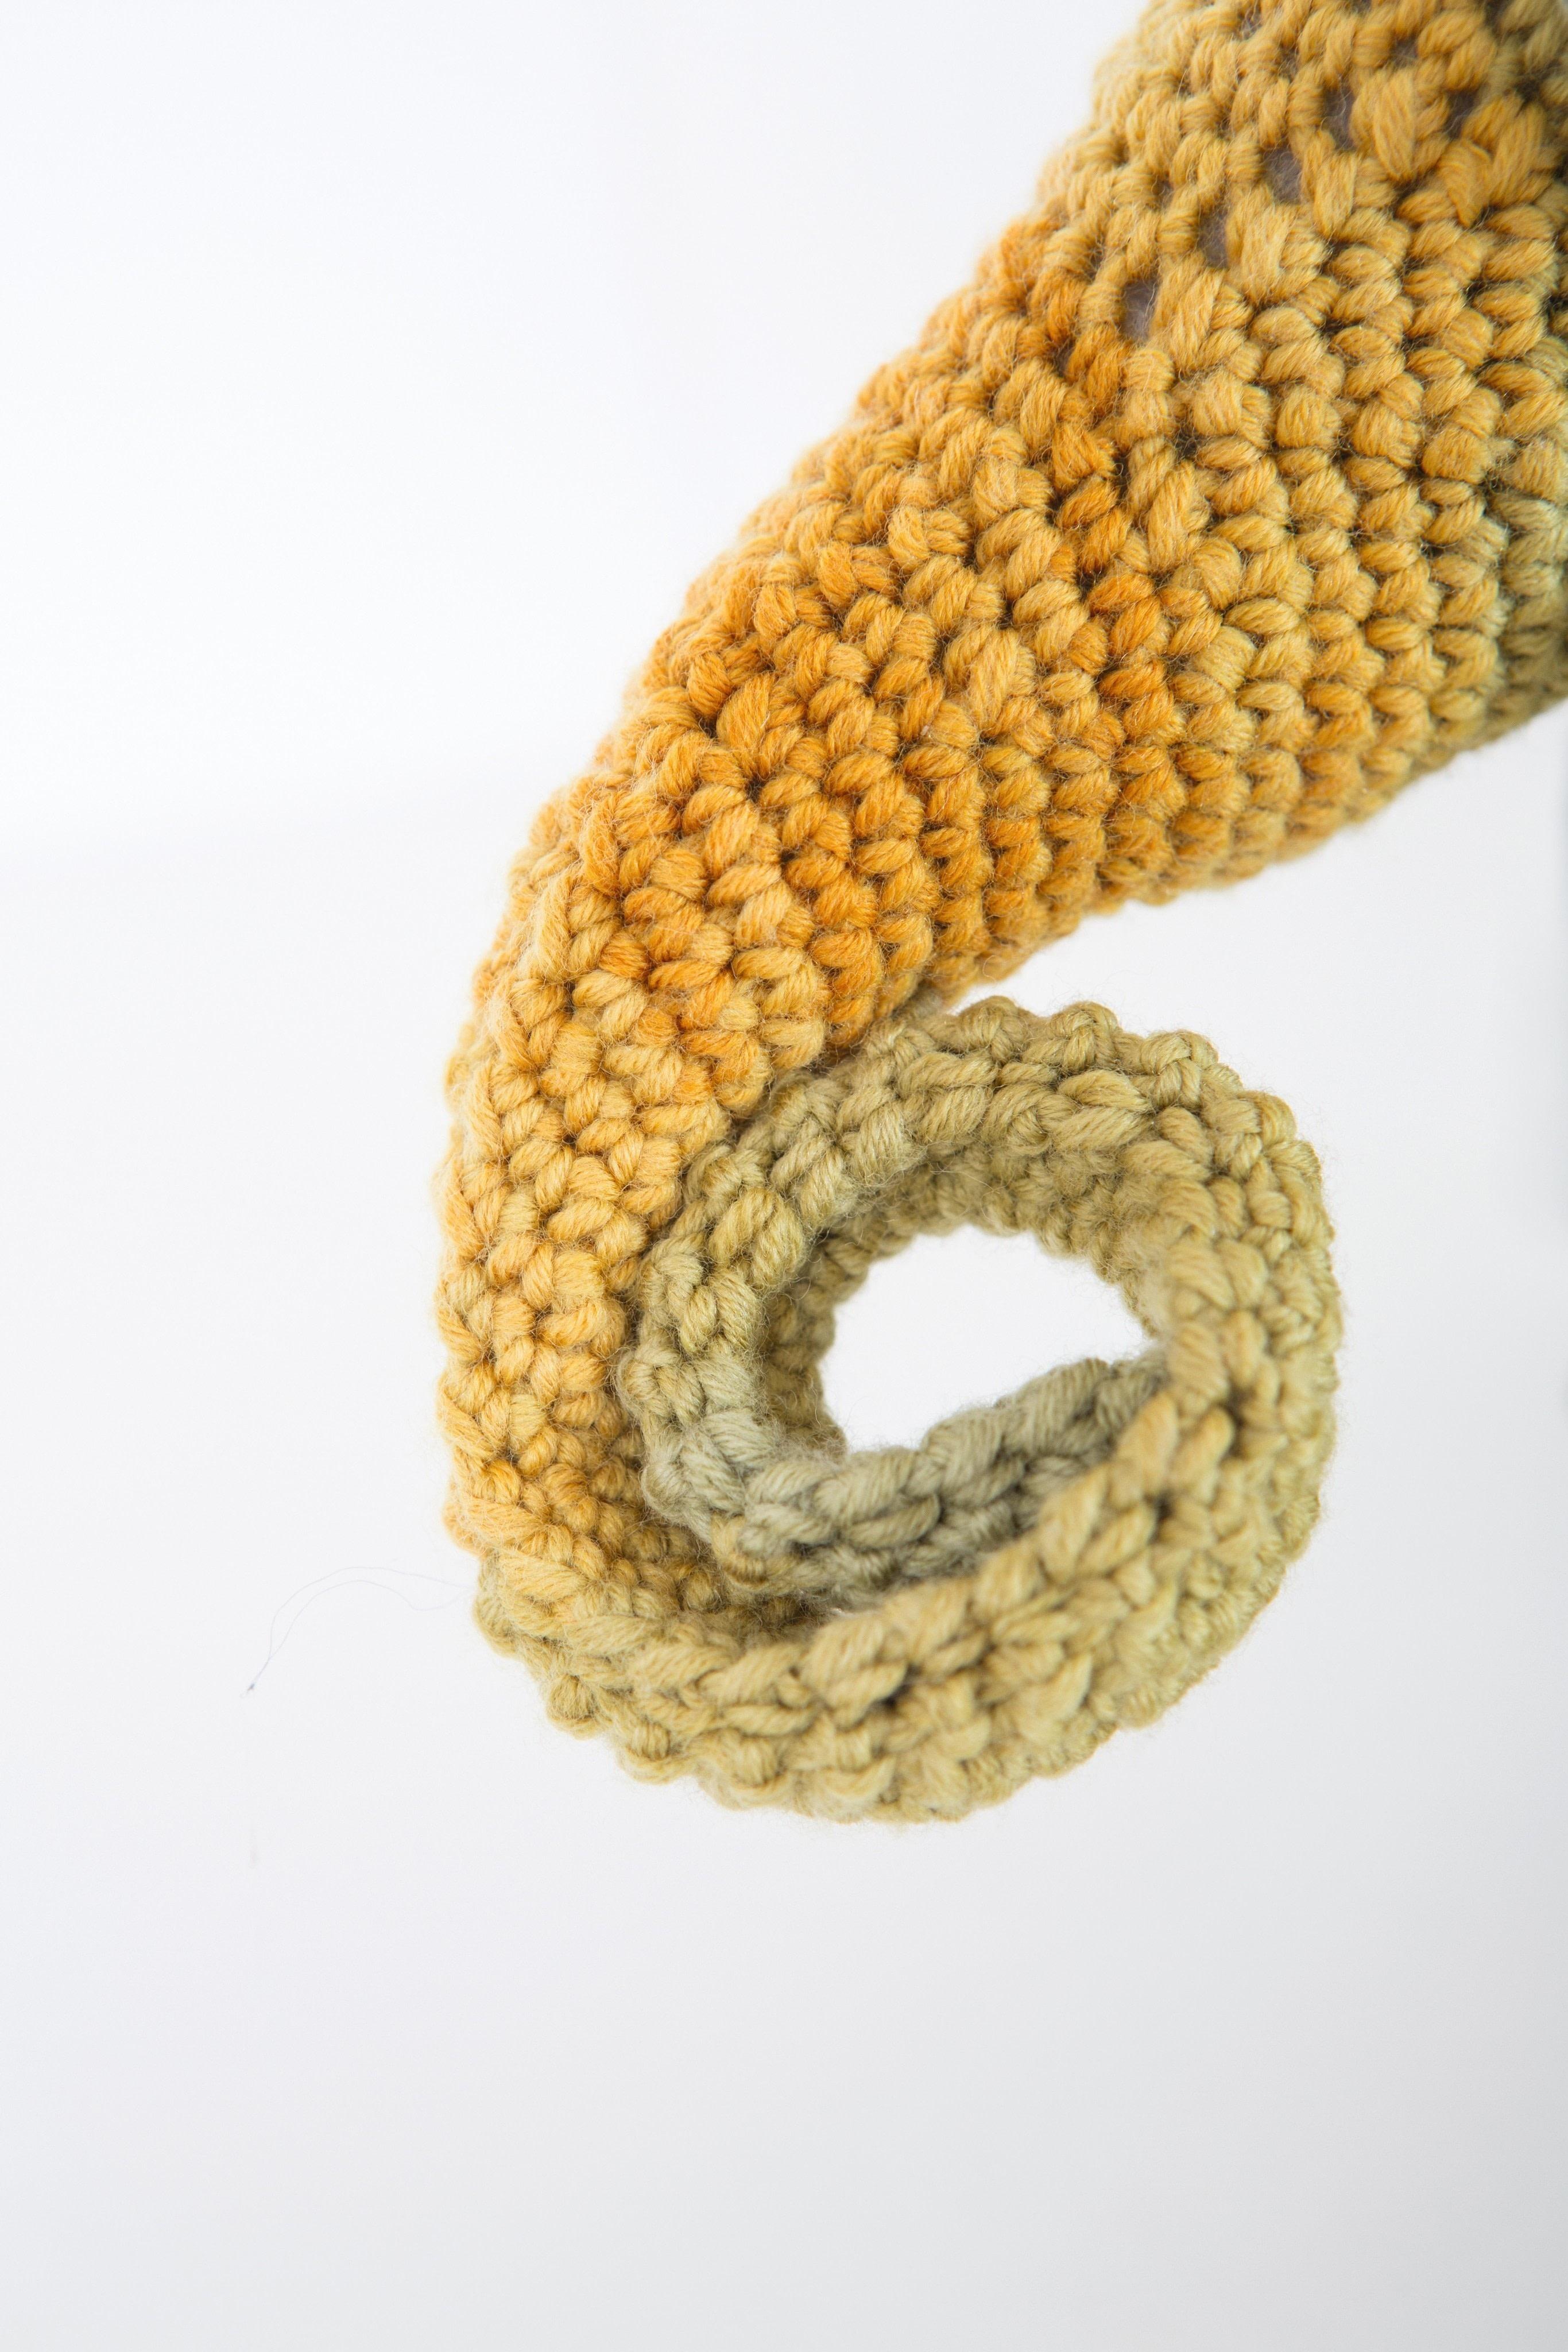 how to make crochet animals